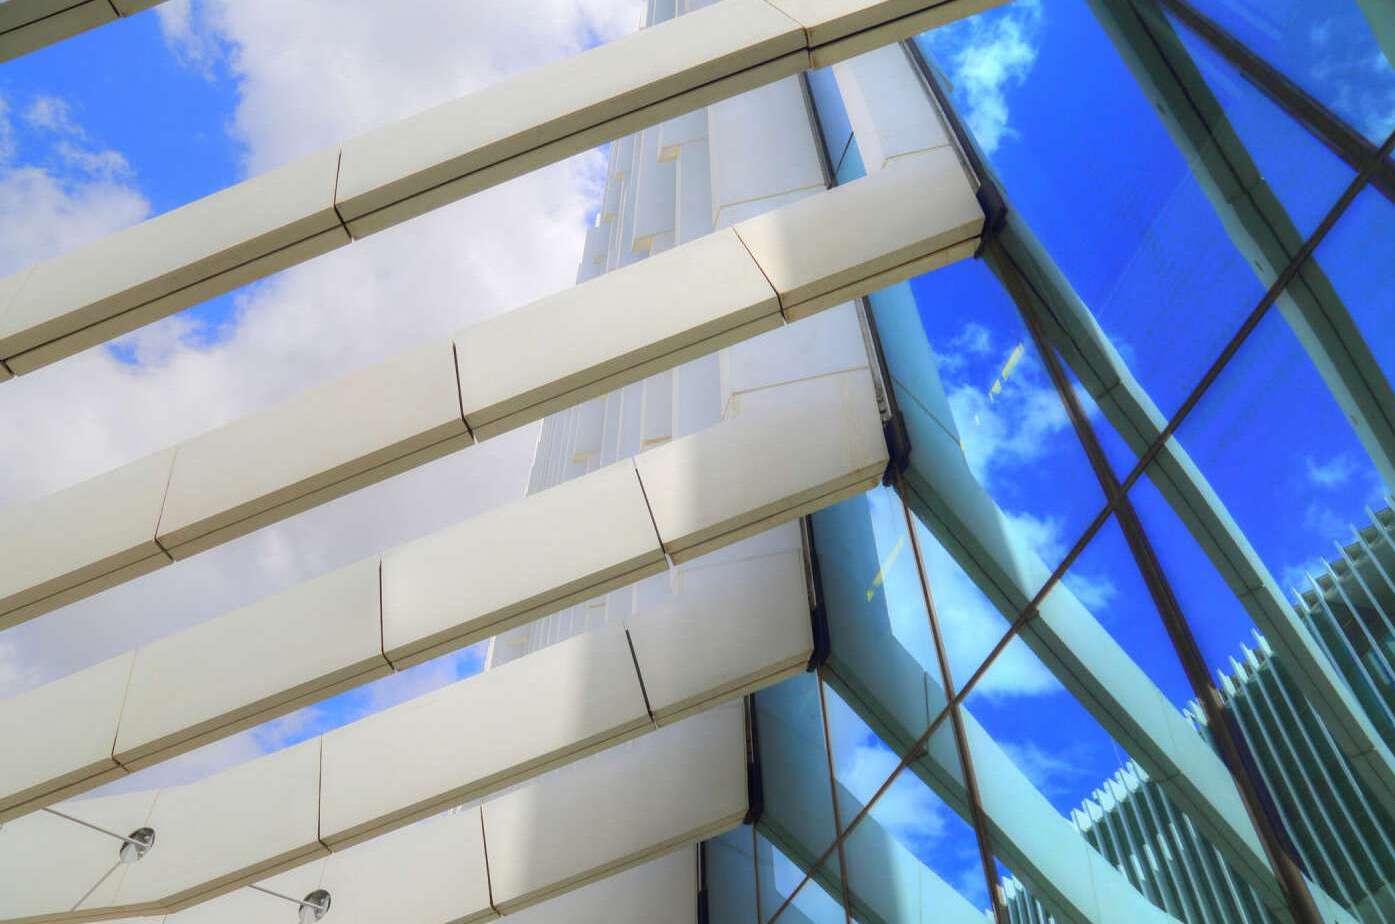 Building ceiling